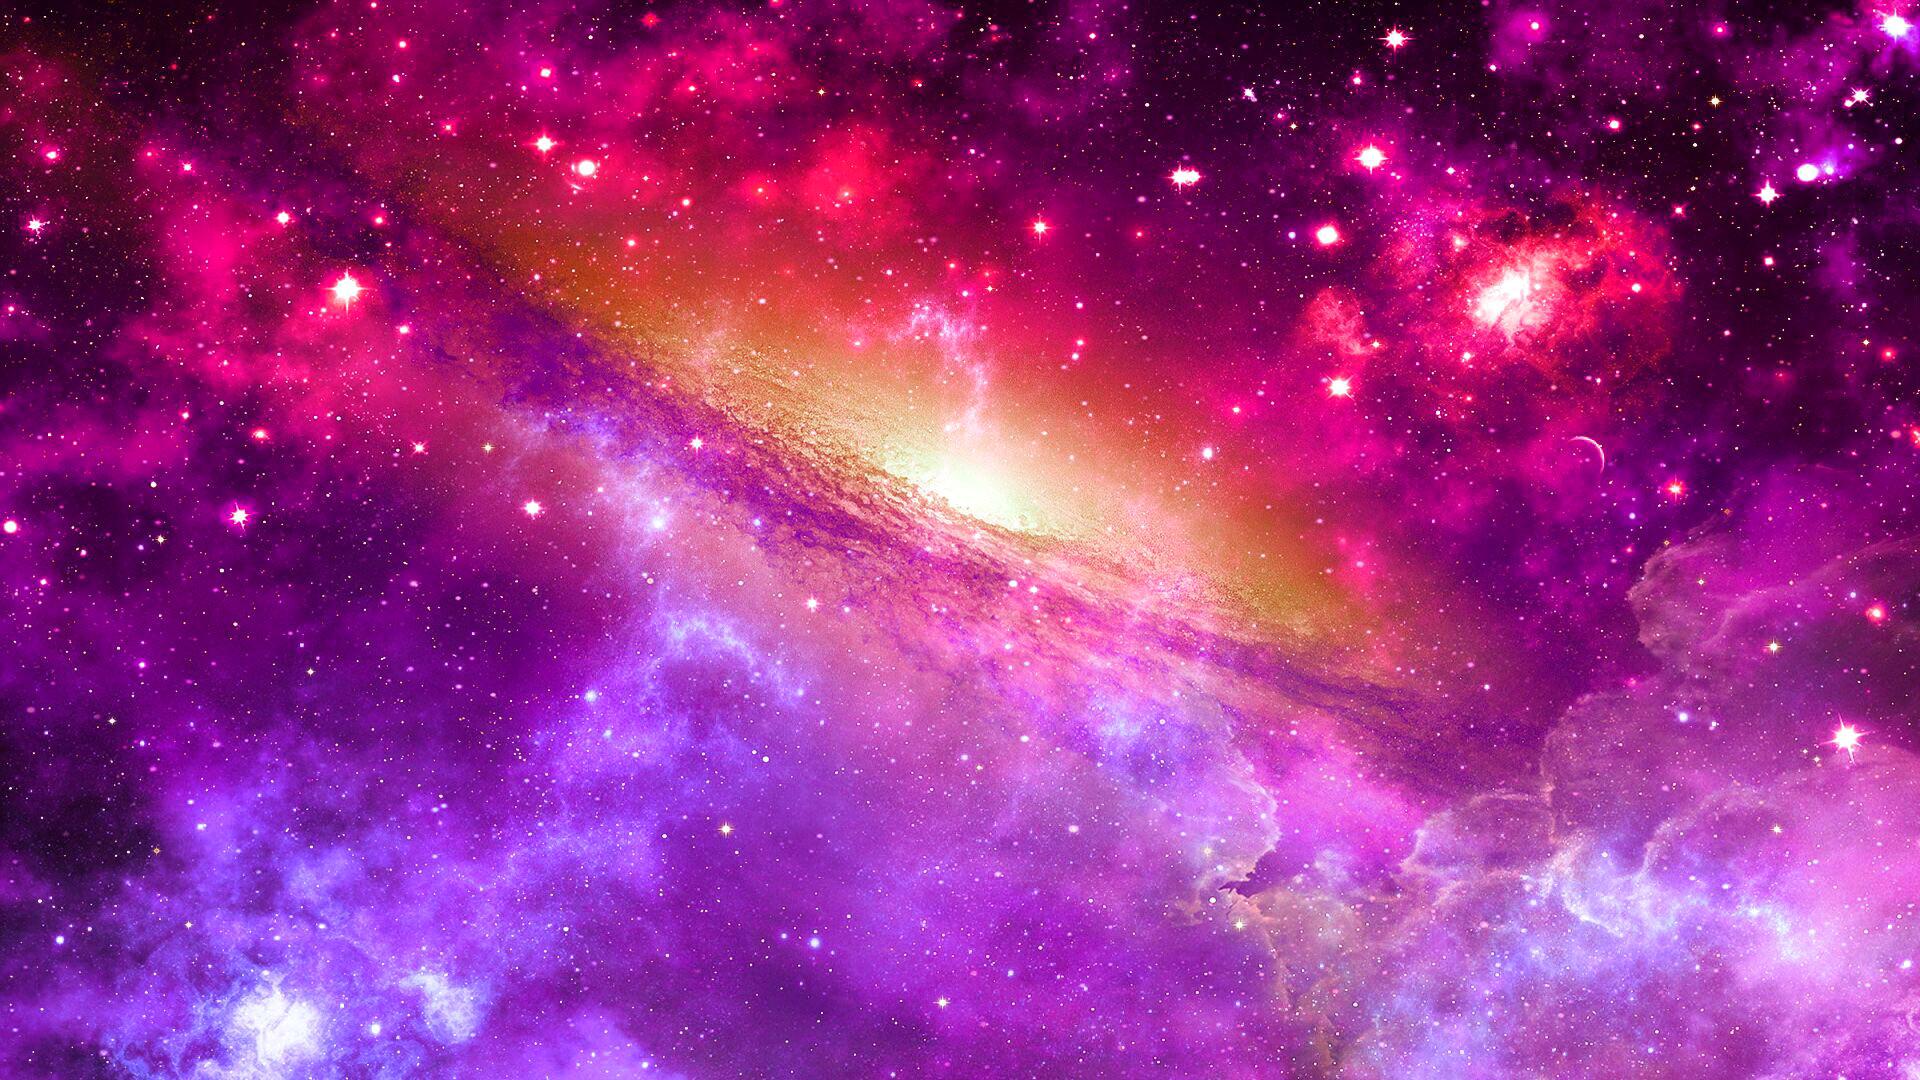 Hd purple space wallpaper 65 images - Purple space wallpaper ...